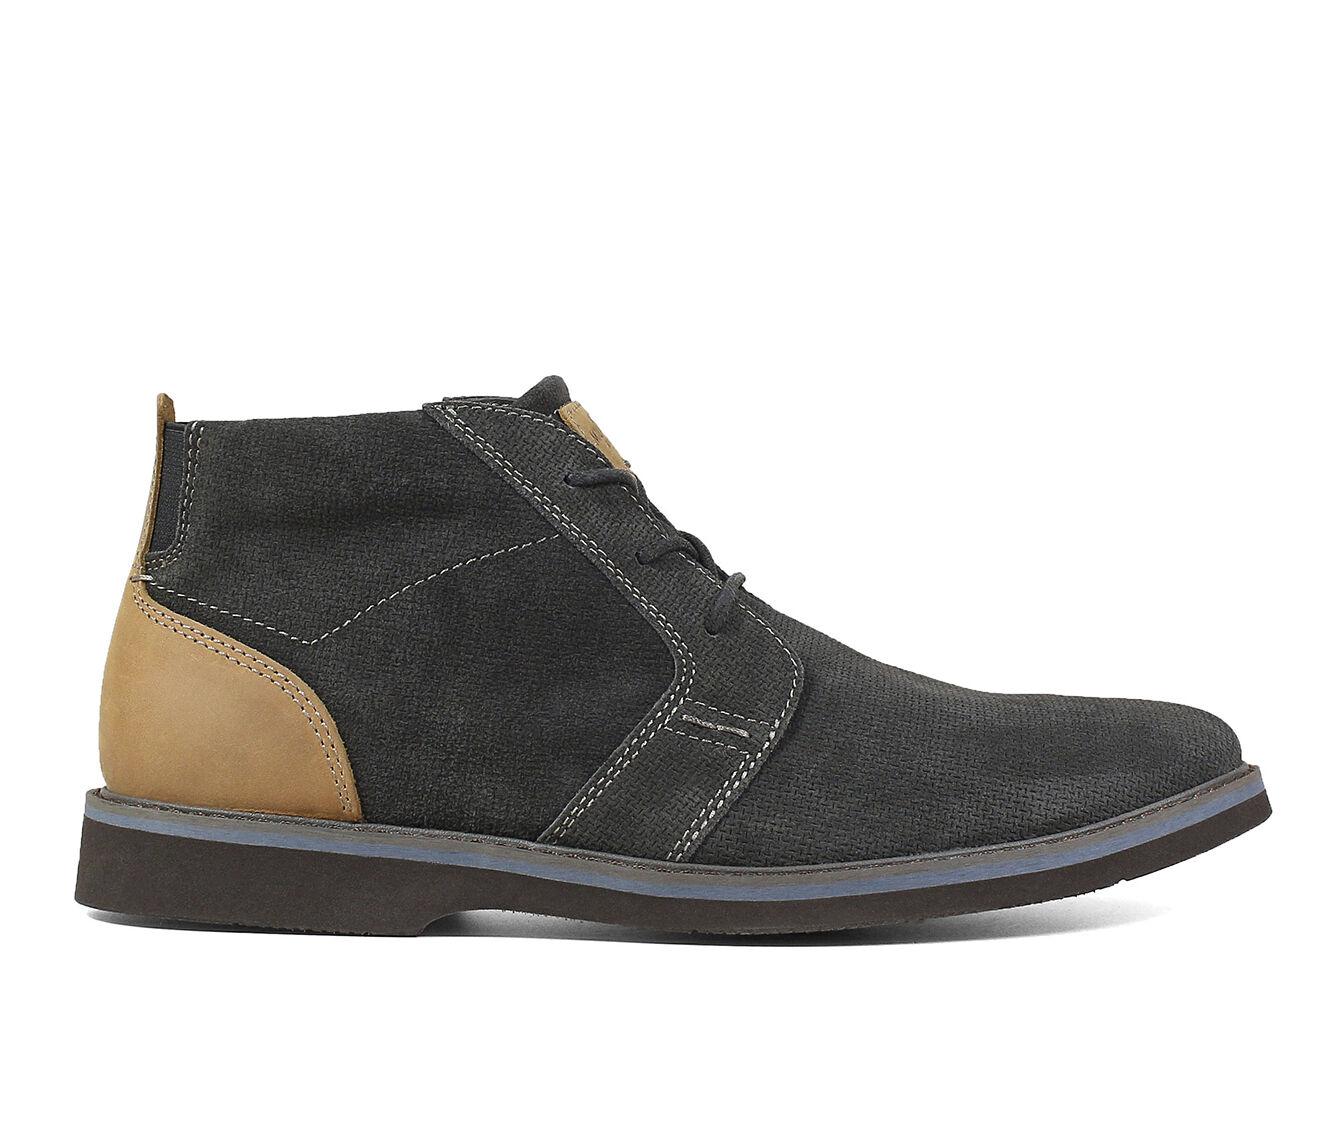 purchase cheap new Men's Nunn Bush Barklay Plain Toe Chukka Dress Shoes Gray Multi